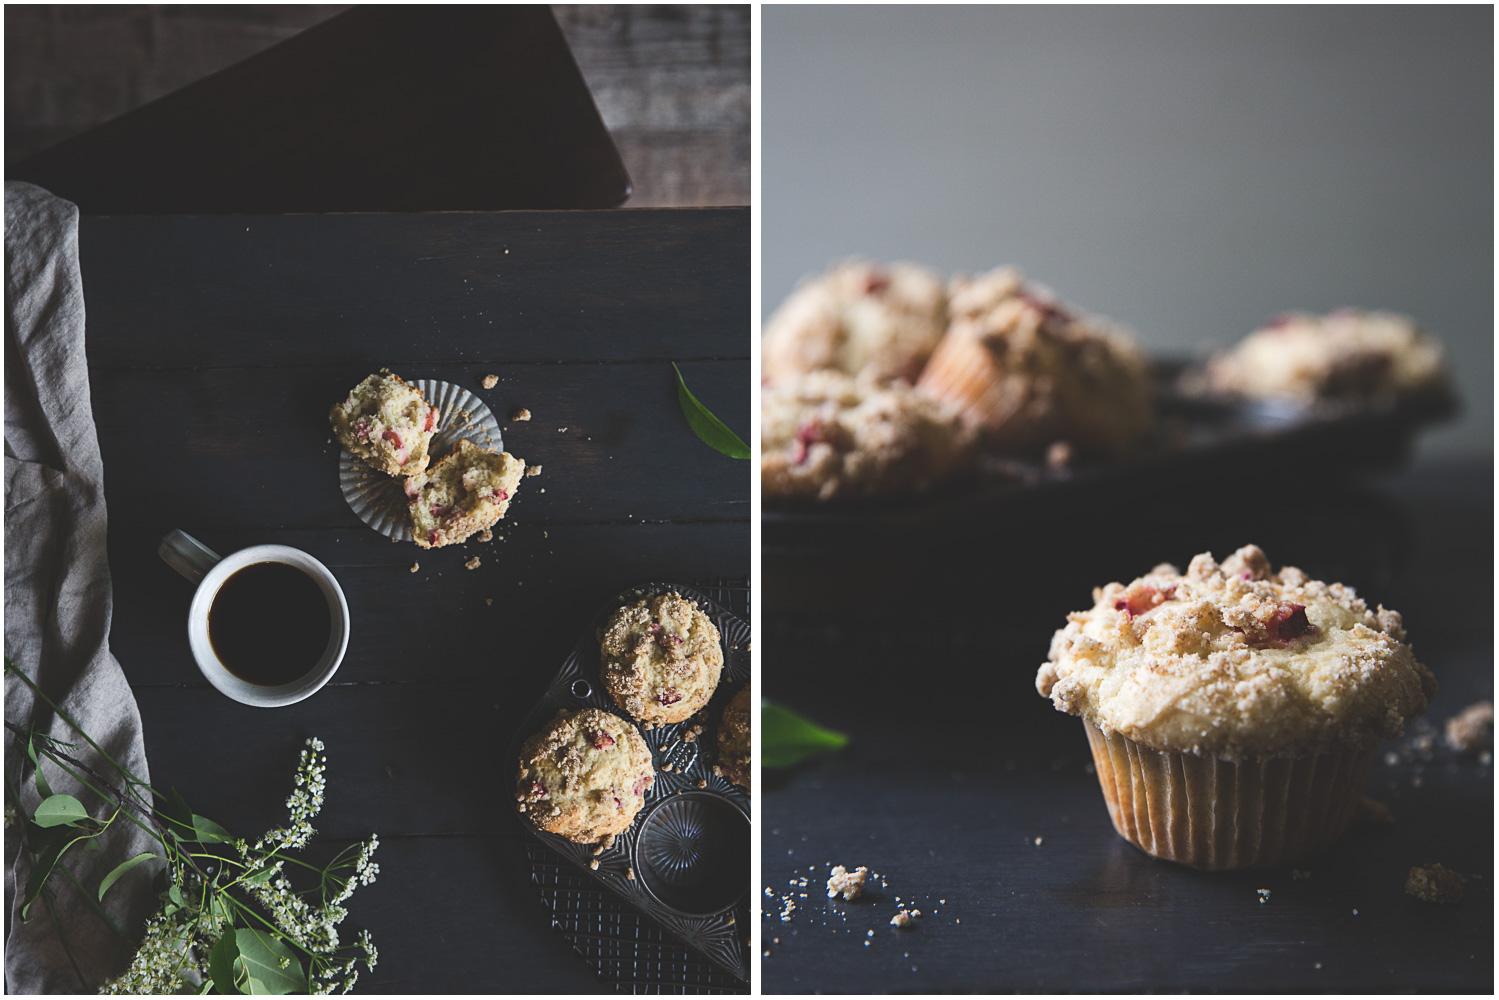 Rainy summer morning with fresh rhubarb muffins